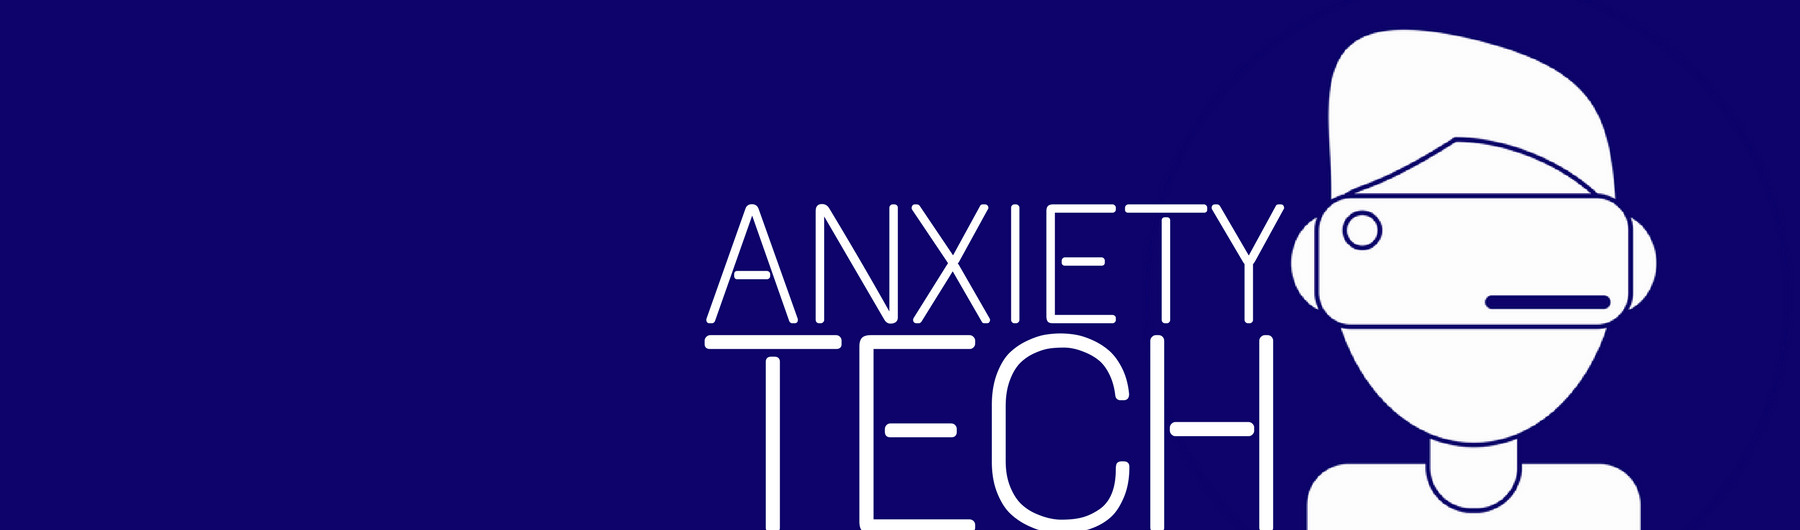 anxiety tech